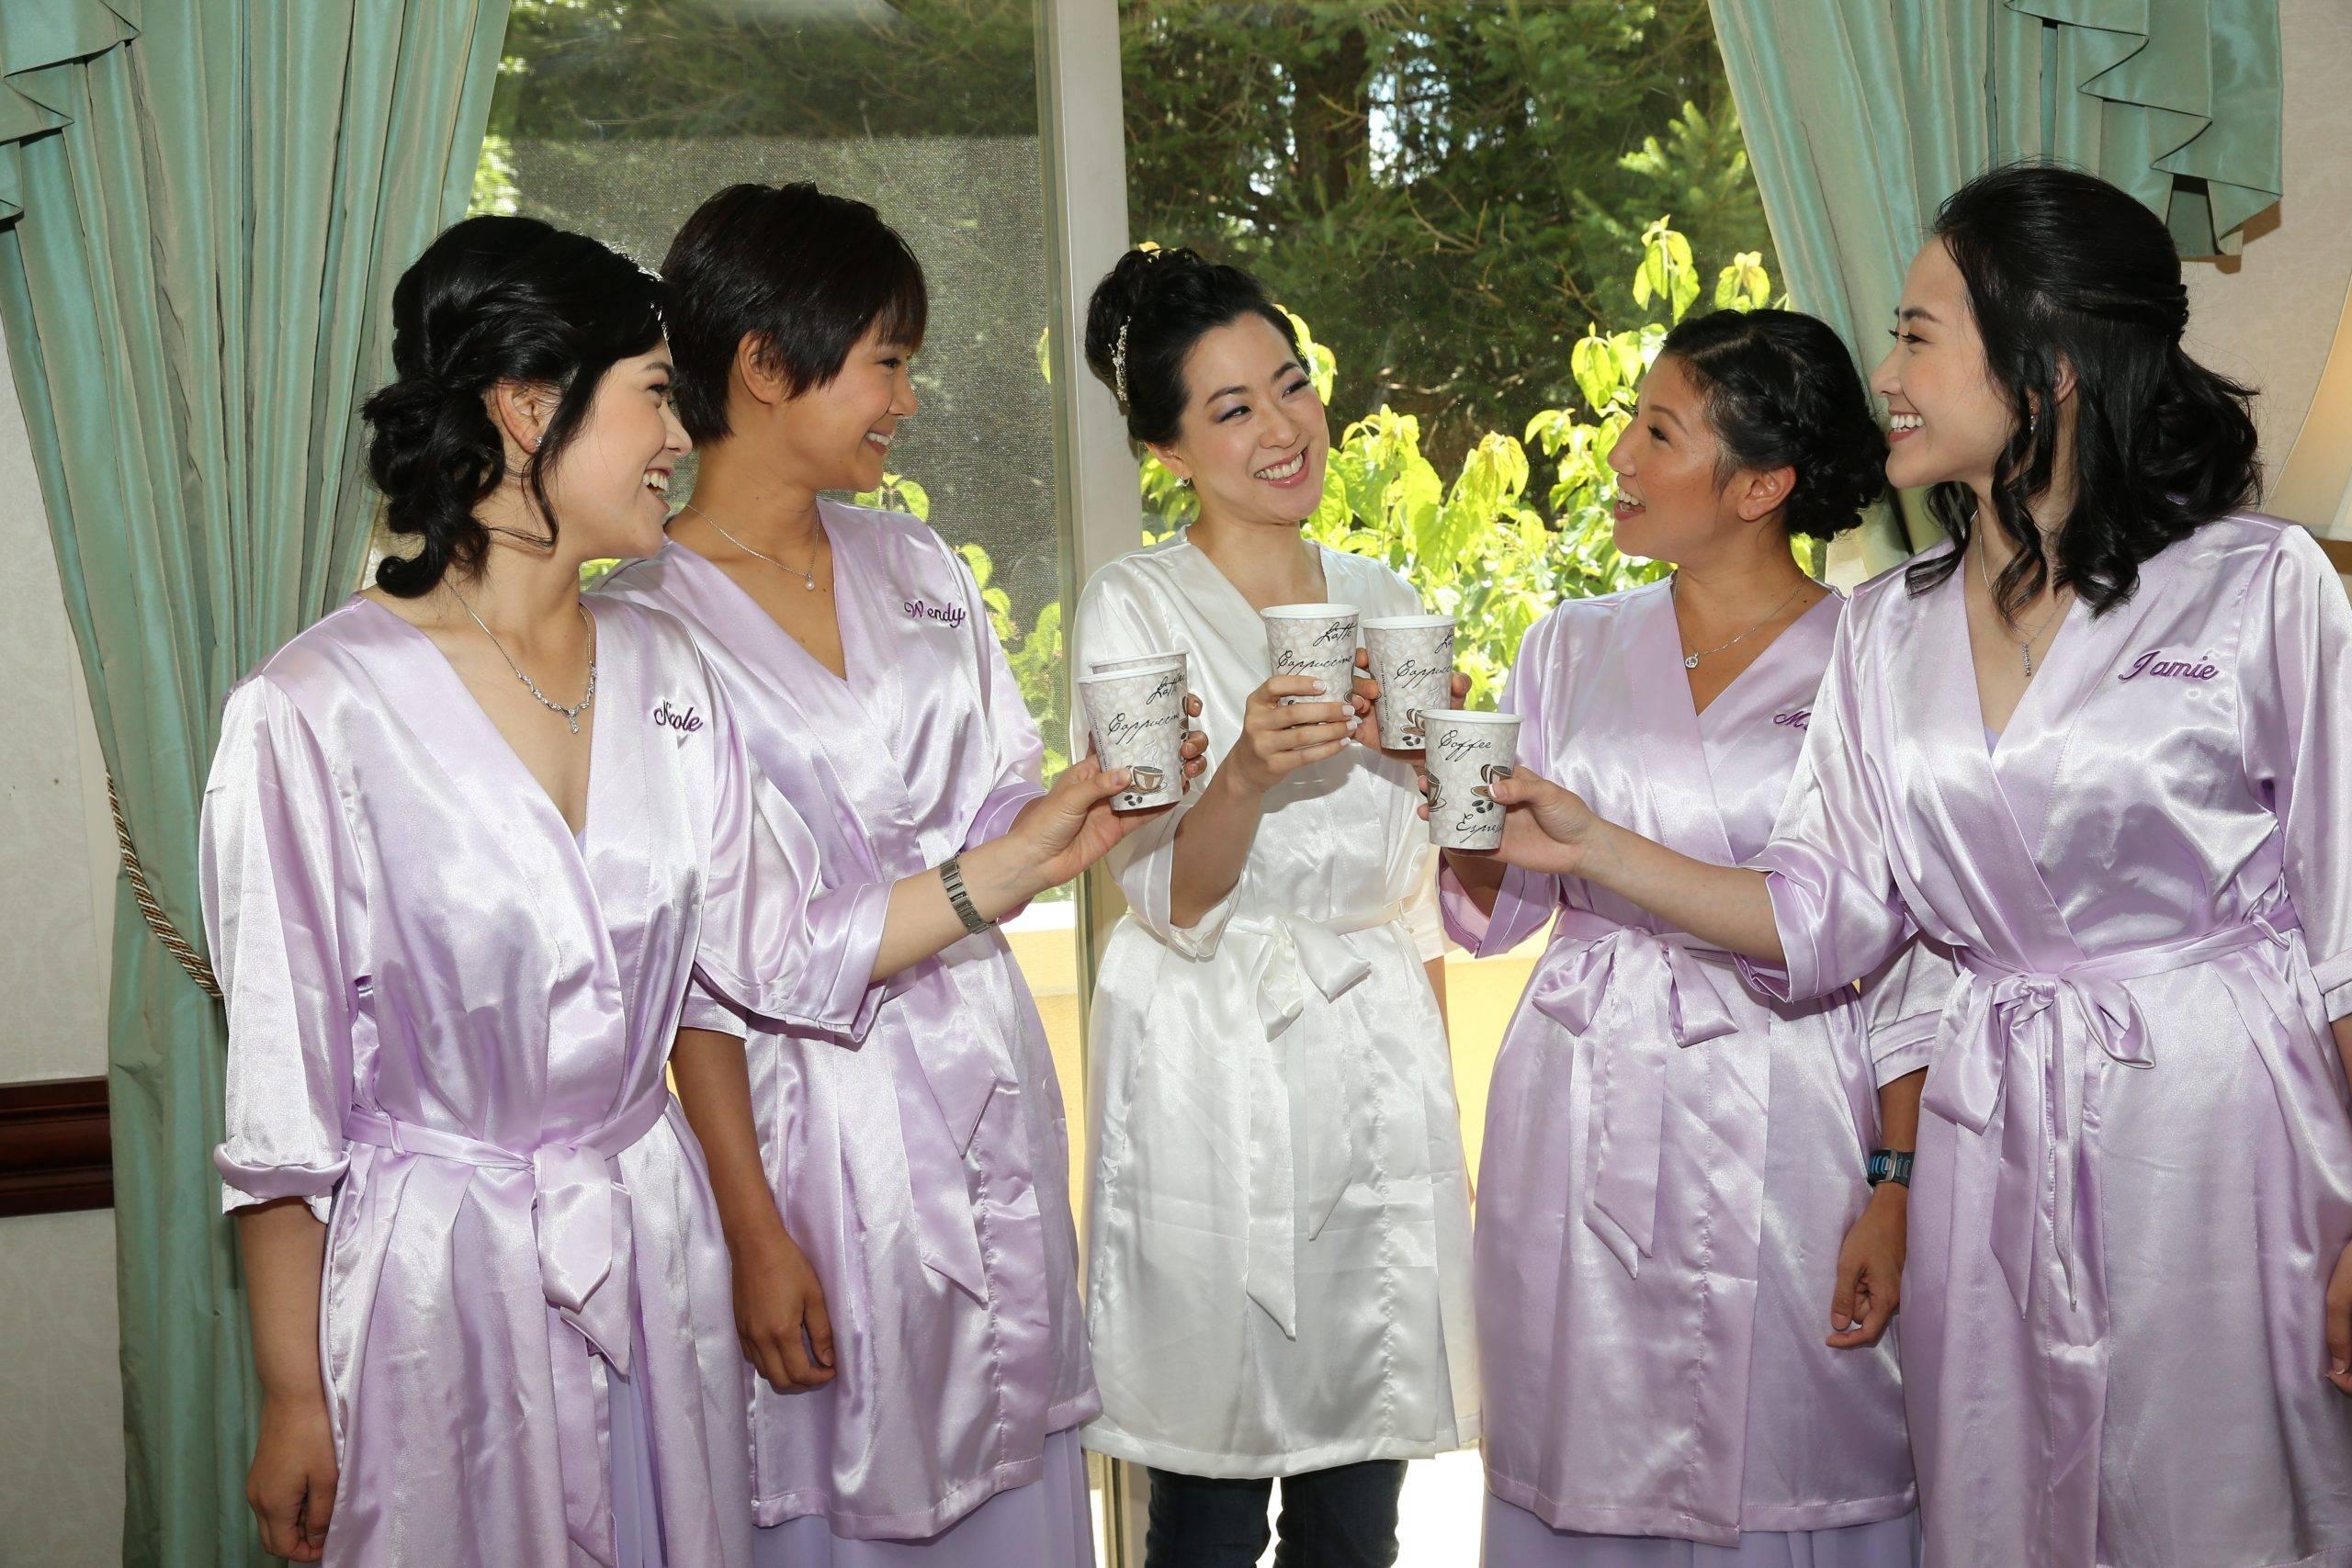 Brooklake bride and bridesmaids getting ready